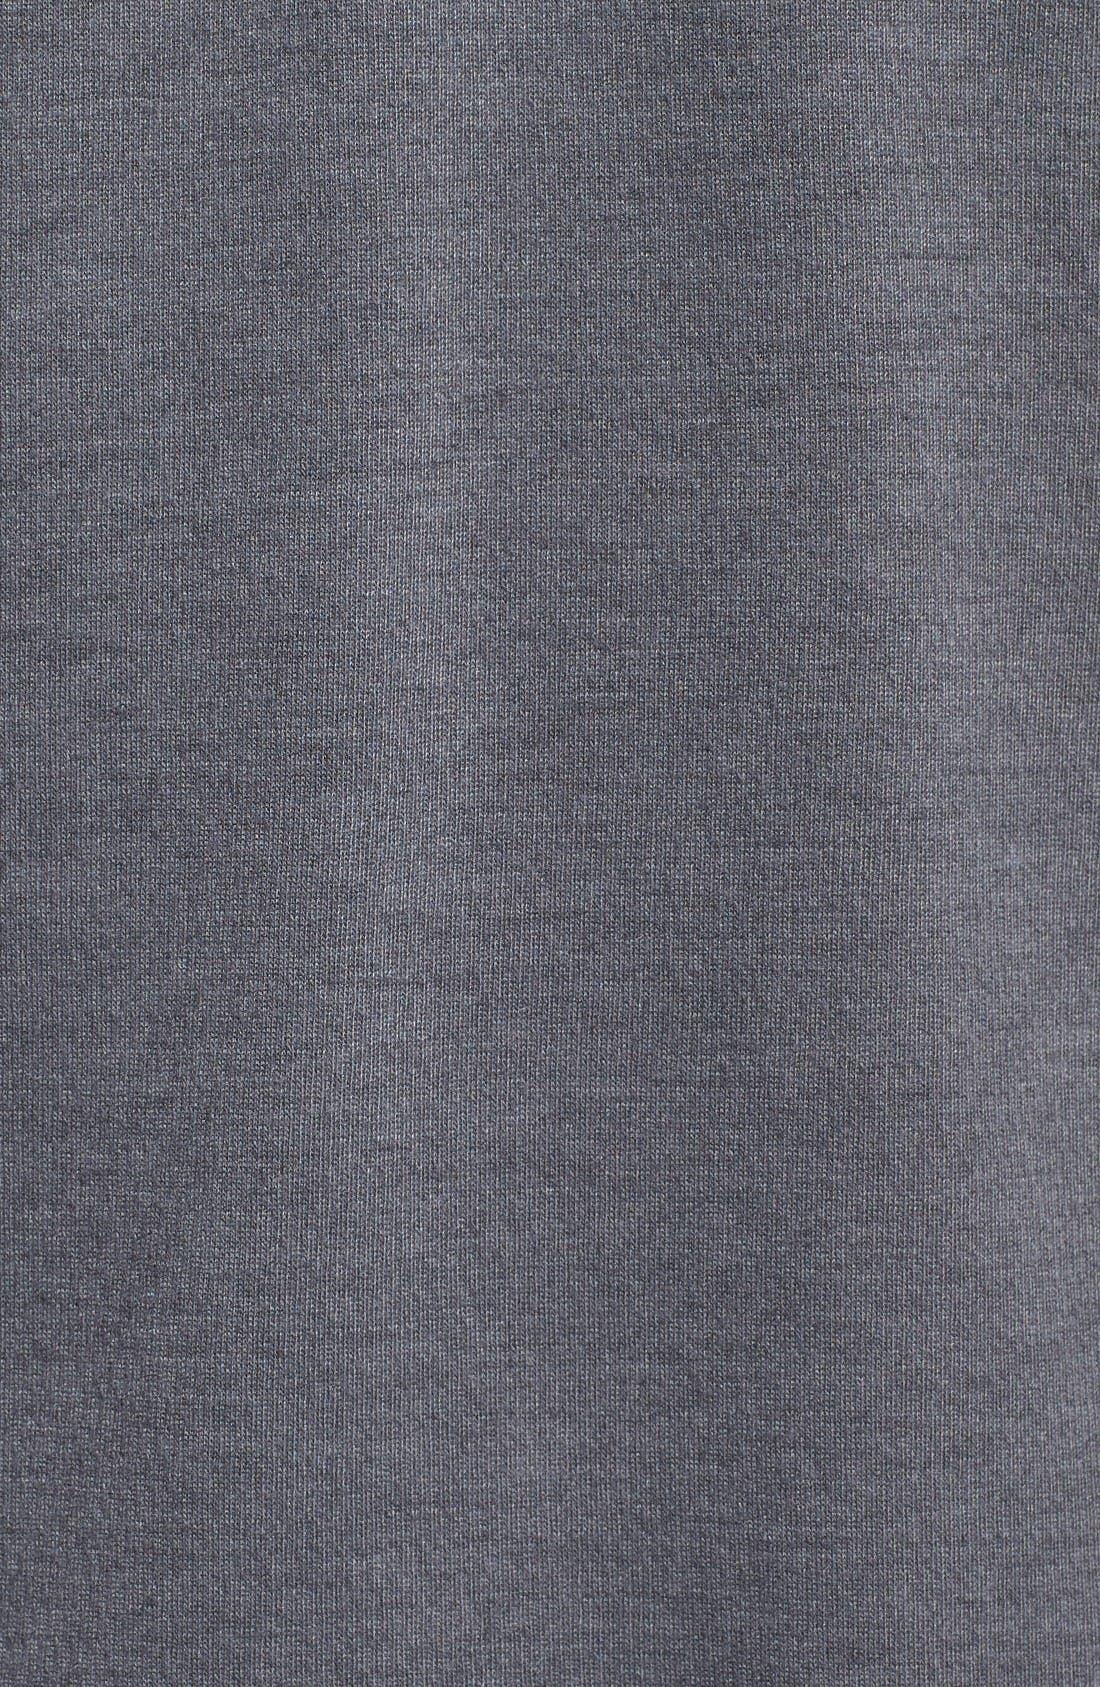 Alternate Image 5  - Under Armour ColdGear® Quarter-Zip Pullover